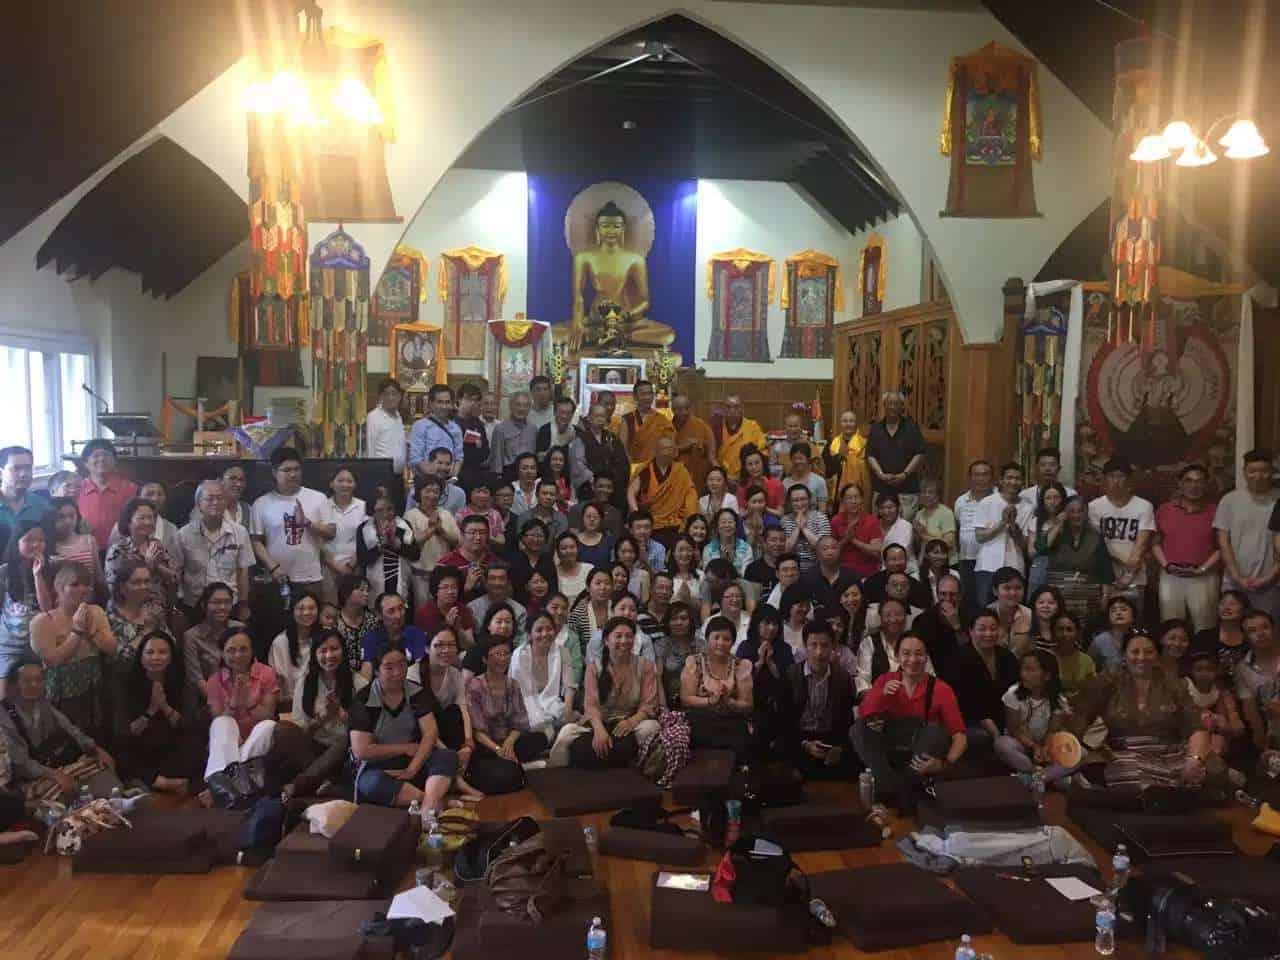 gosok-rinpoche-toronto-2016-4f3913155ad8434bca8db7f76abdc62